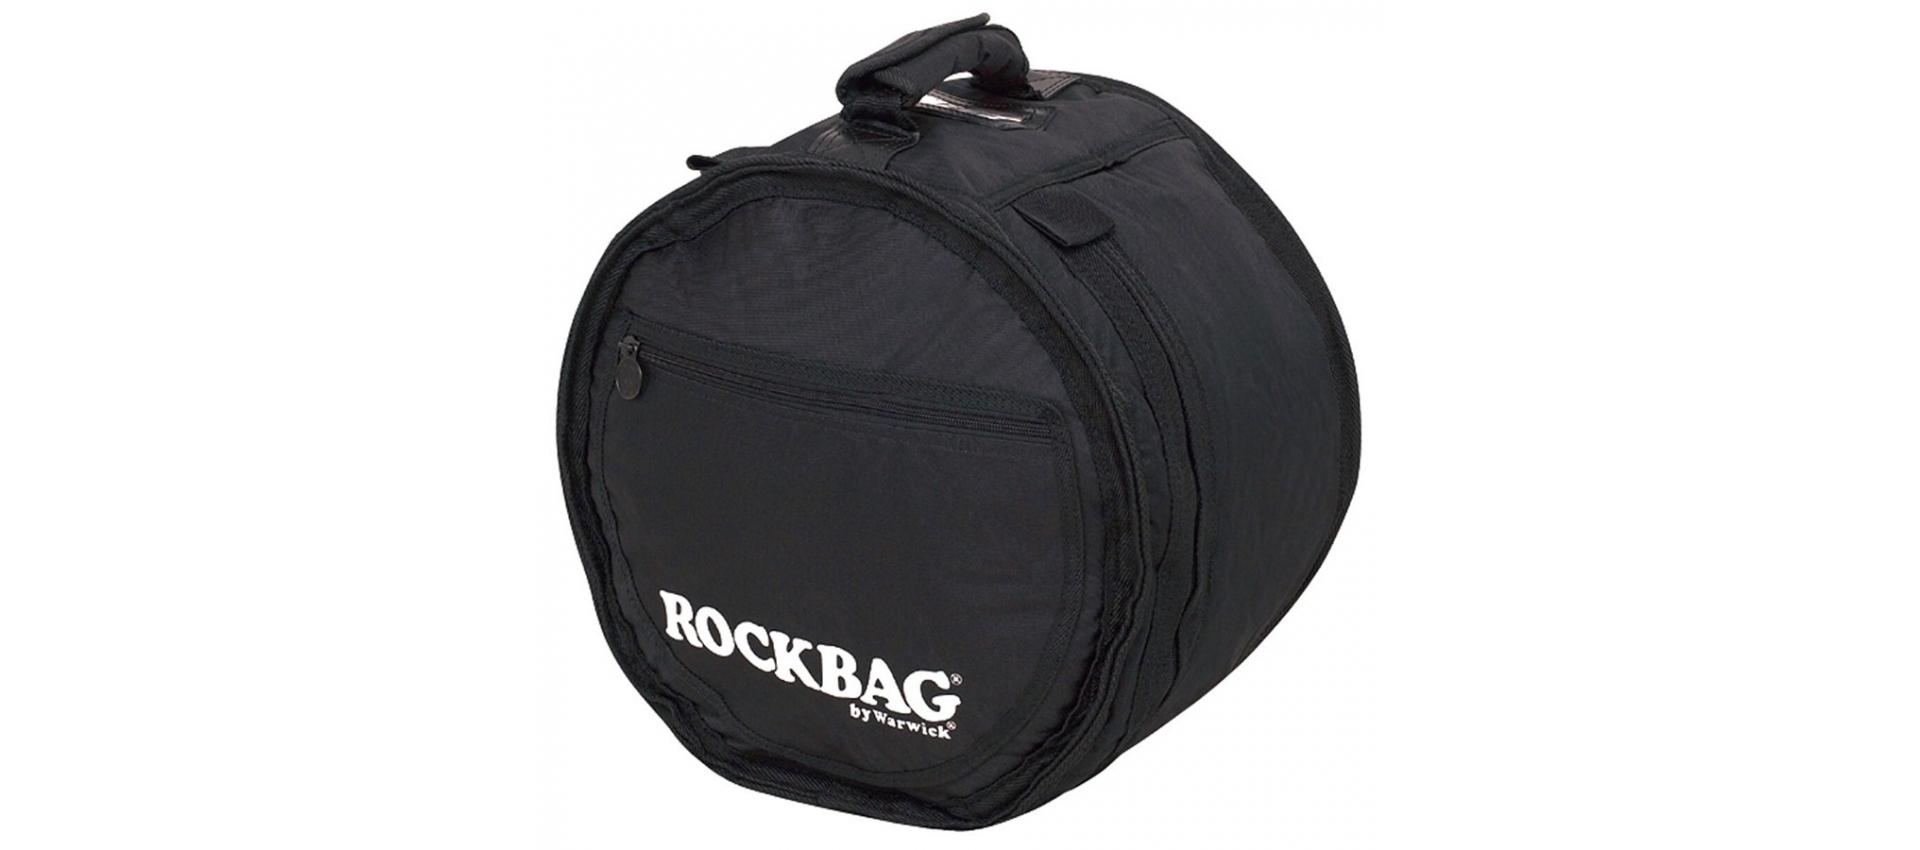 Rockbag rb22571b floor tom 16x16 custodie per fusti for 16x16 floor tom